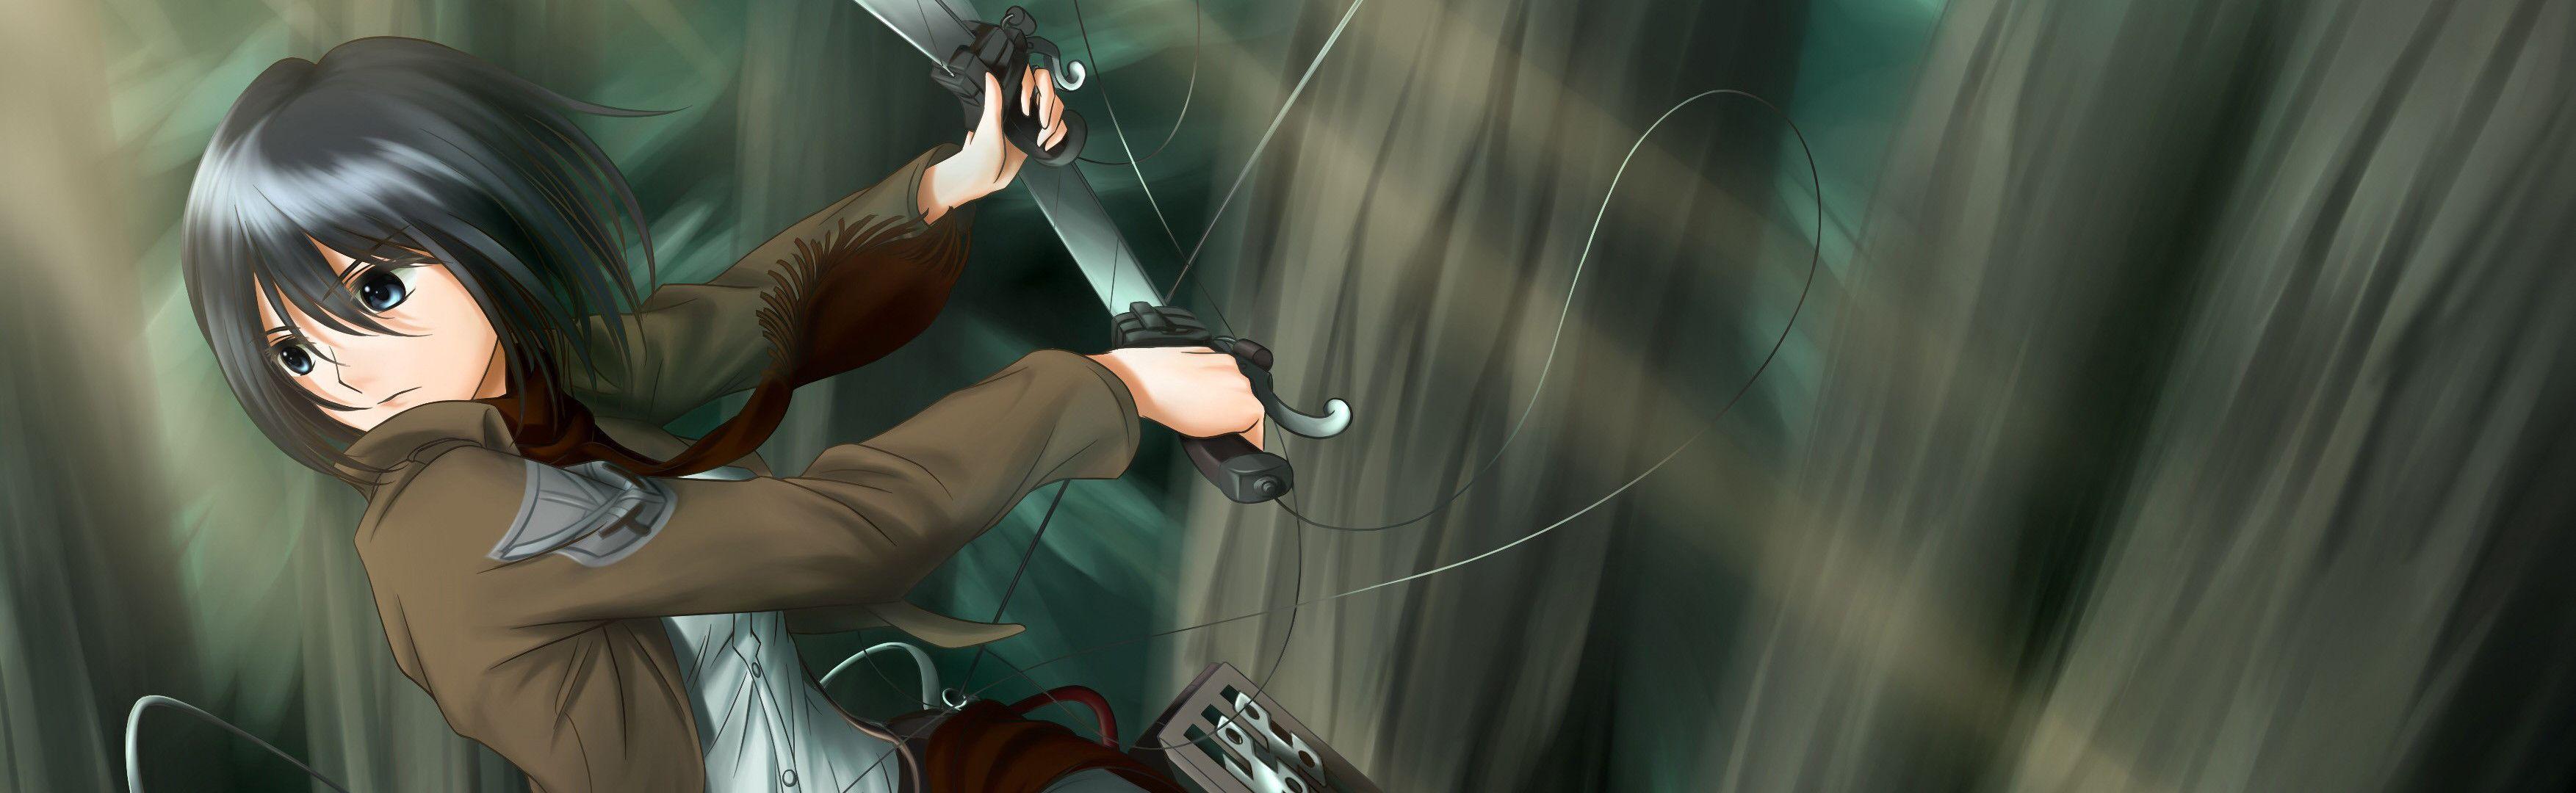 Dual monitor wallpaper 4k anime. Attack On Titan Dual Monitor Wallpapers - Top Free Attack ...